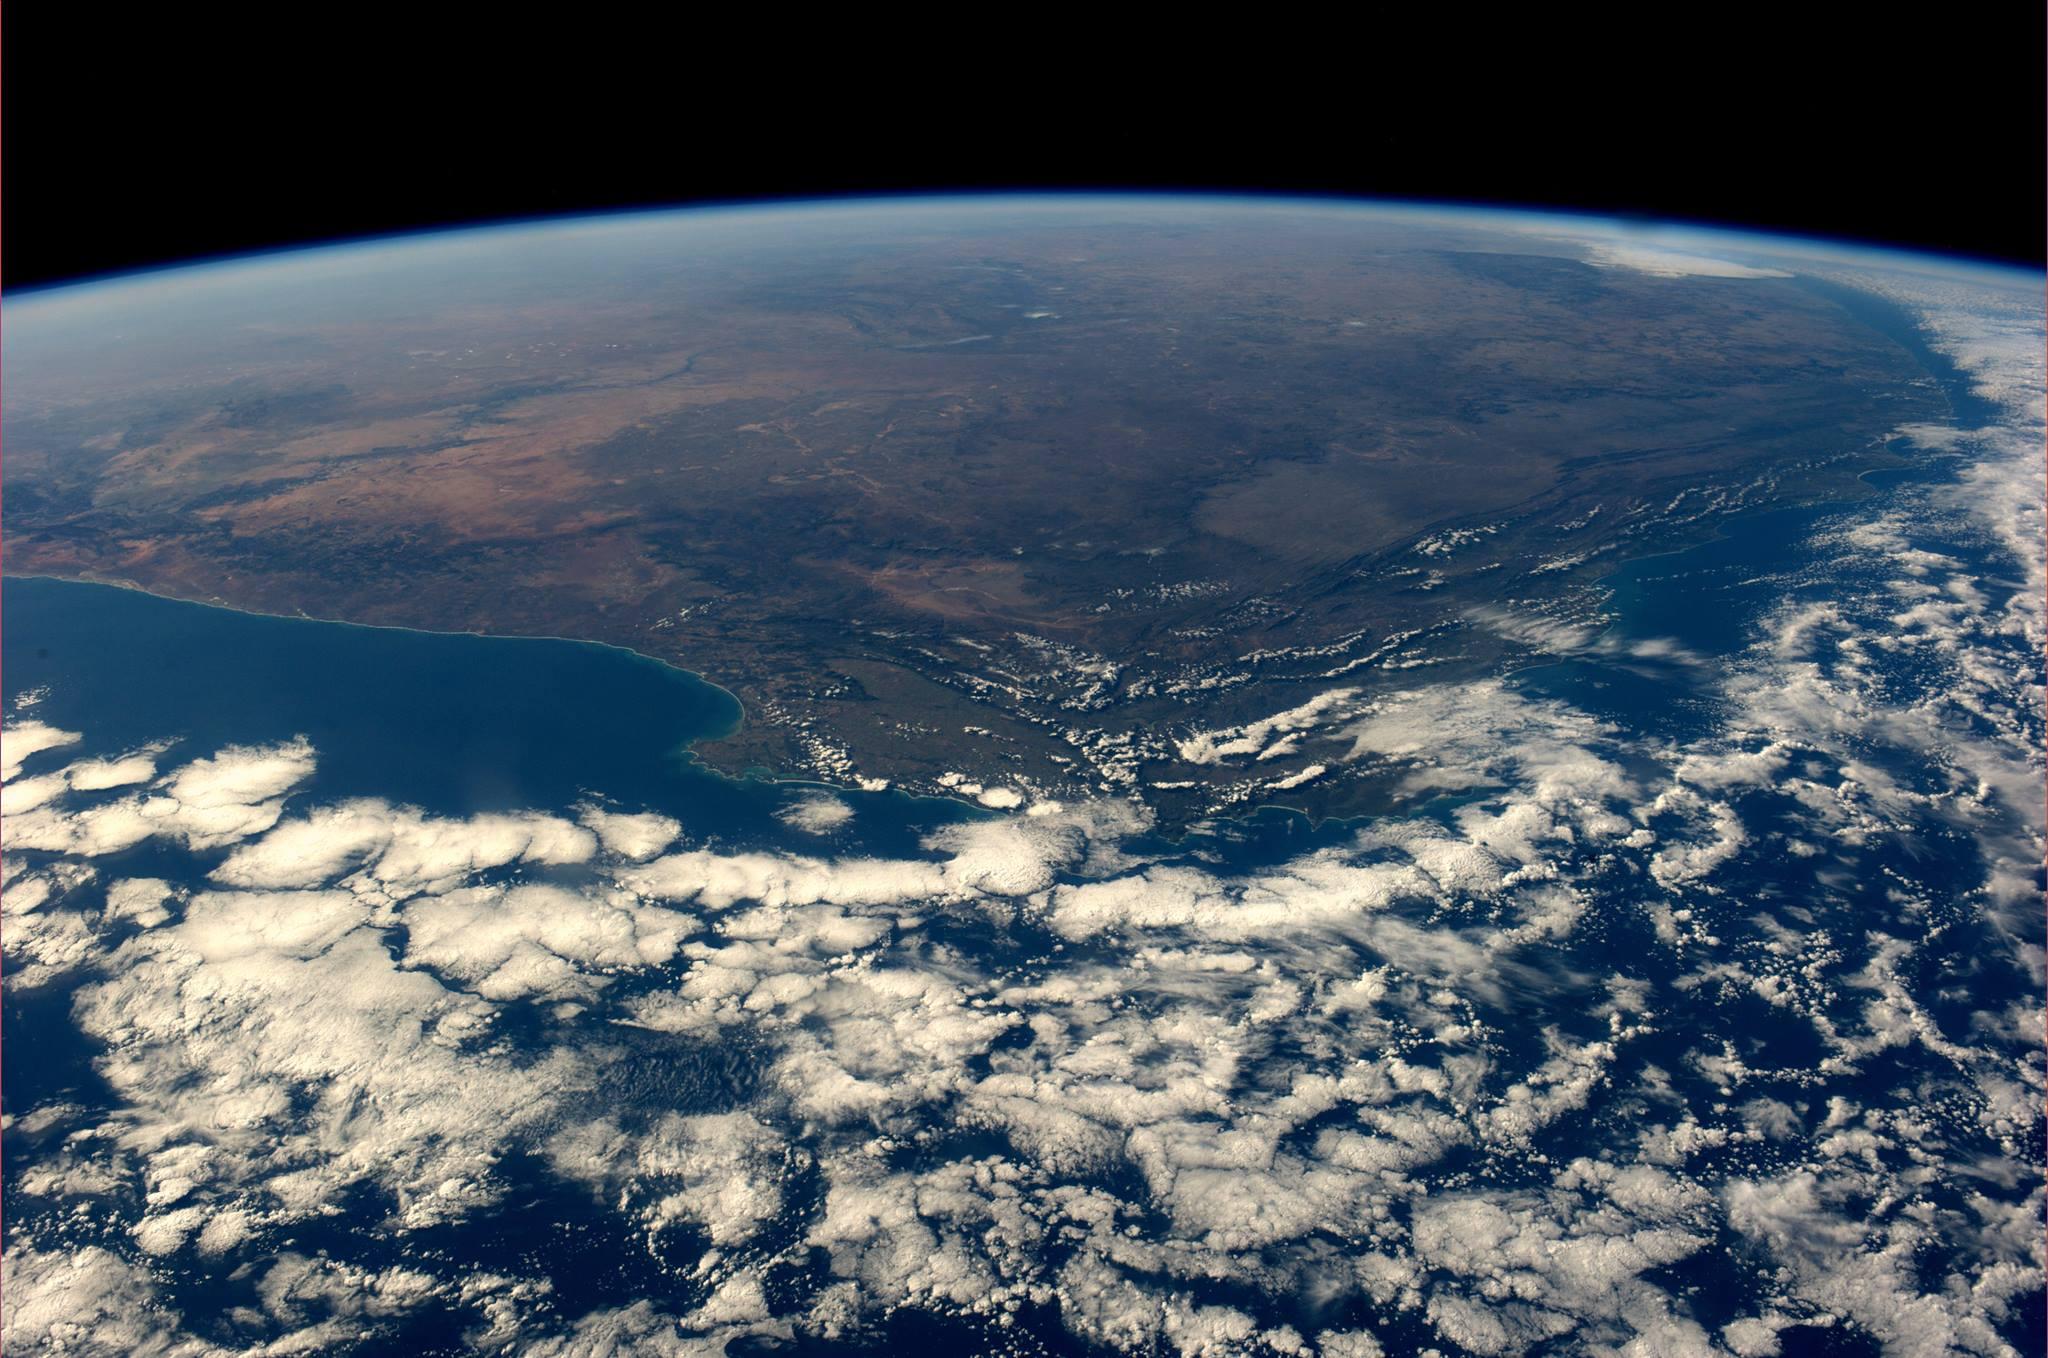 Photos astronaut Alexander Gerst 11